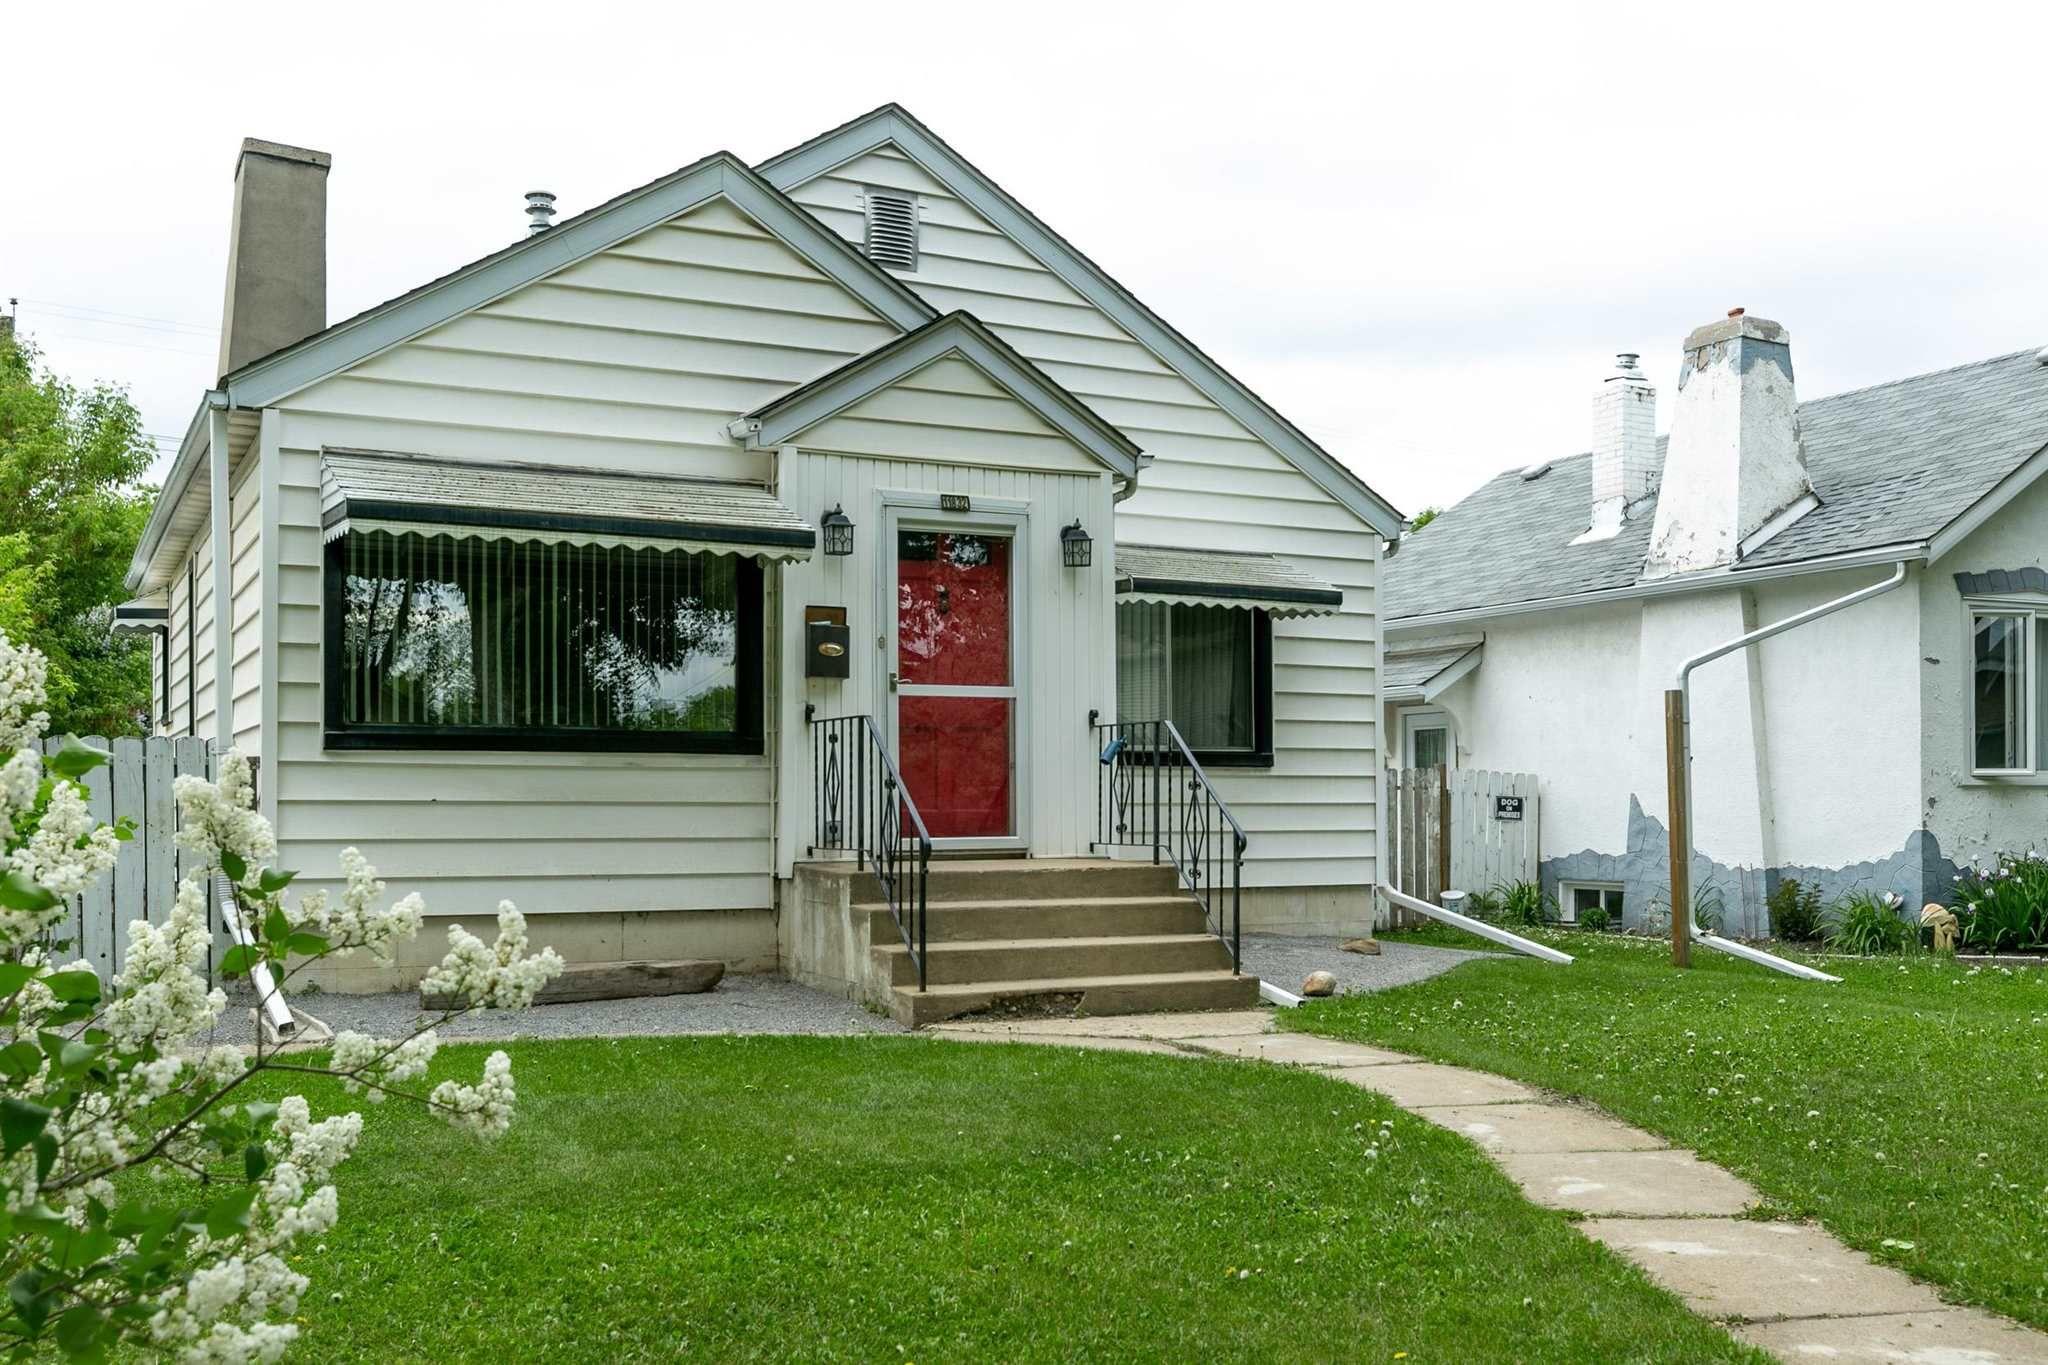 Main Photo: 11832 95 Street in Edmonton: Zone 05 House for sale : MLS®# E4249455